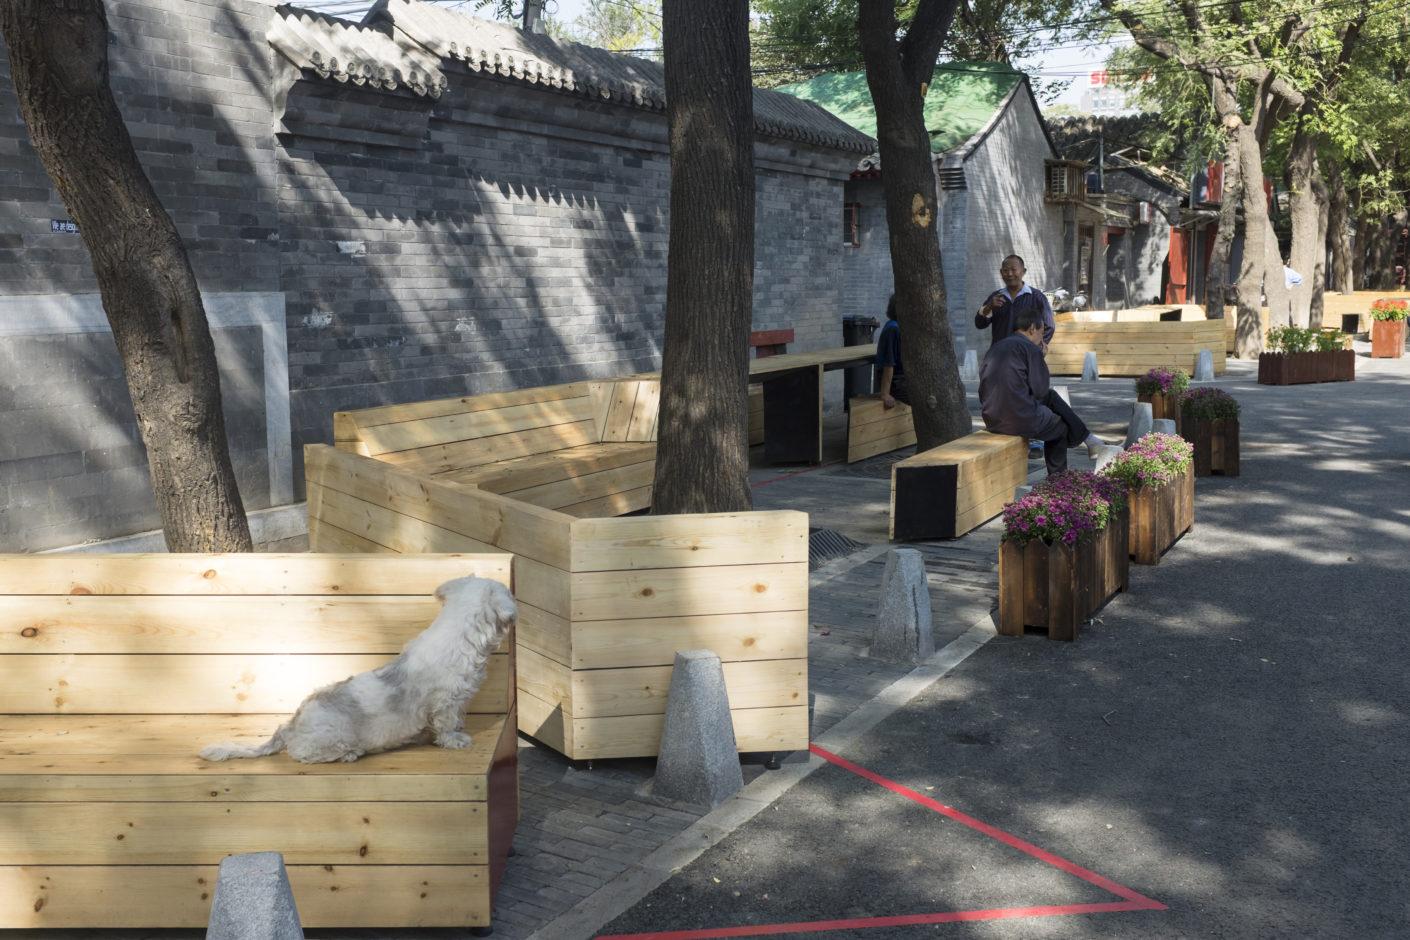 Baitasi Remade: SuperCounter in hutong Baitasi, Beijing, by BaO architects at the Beijing Design Week 2016